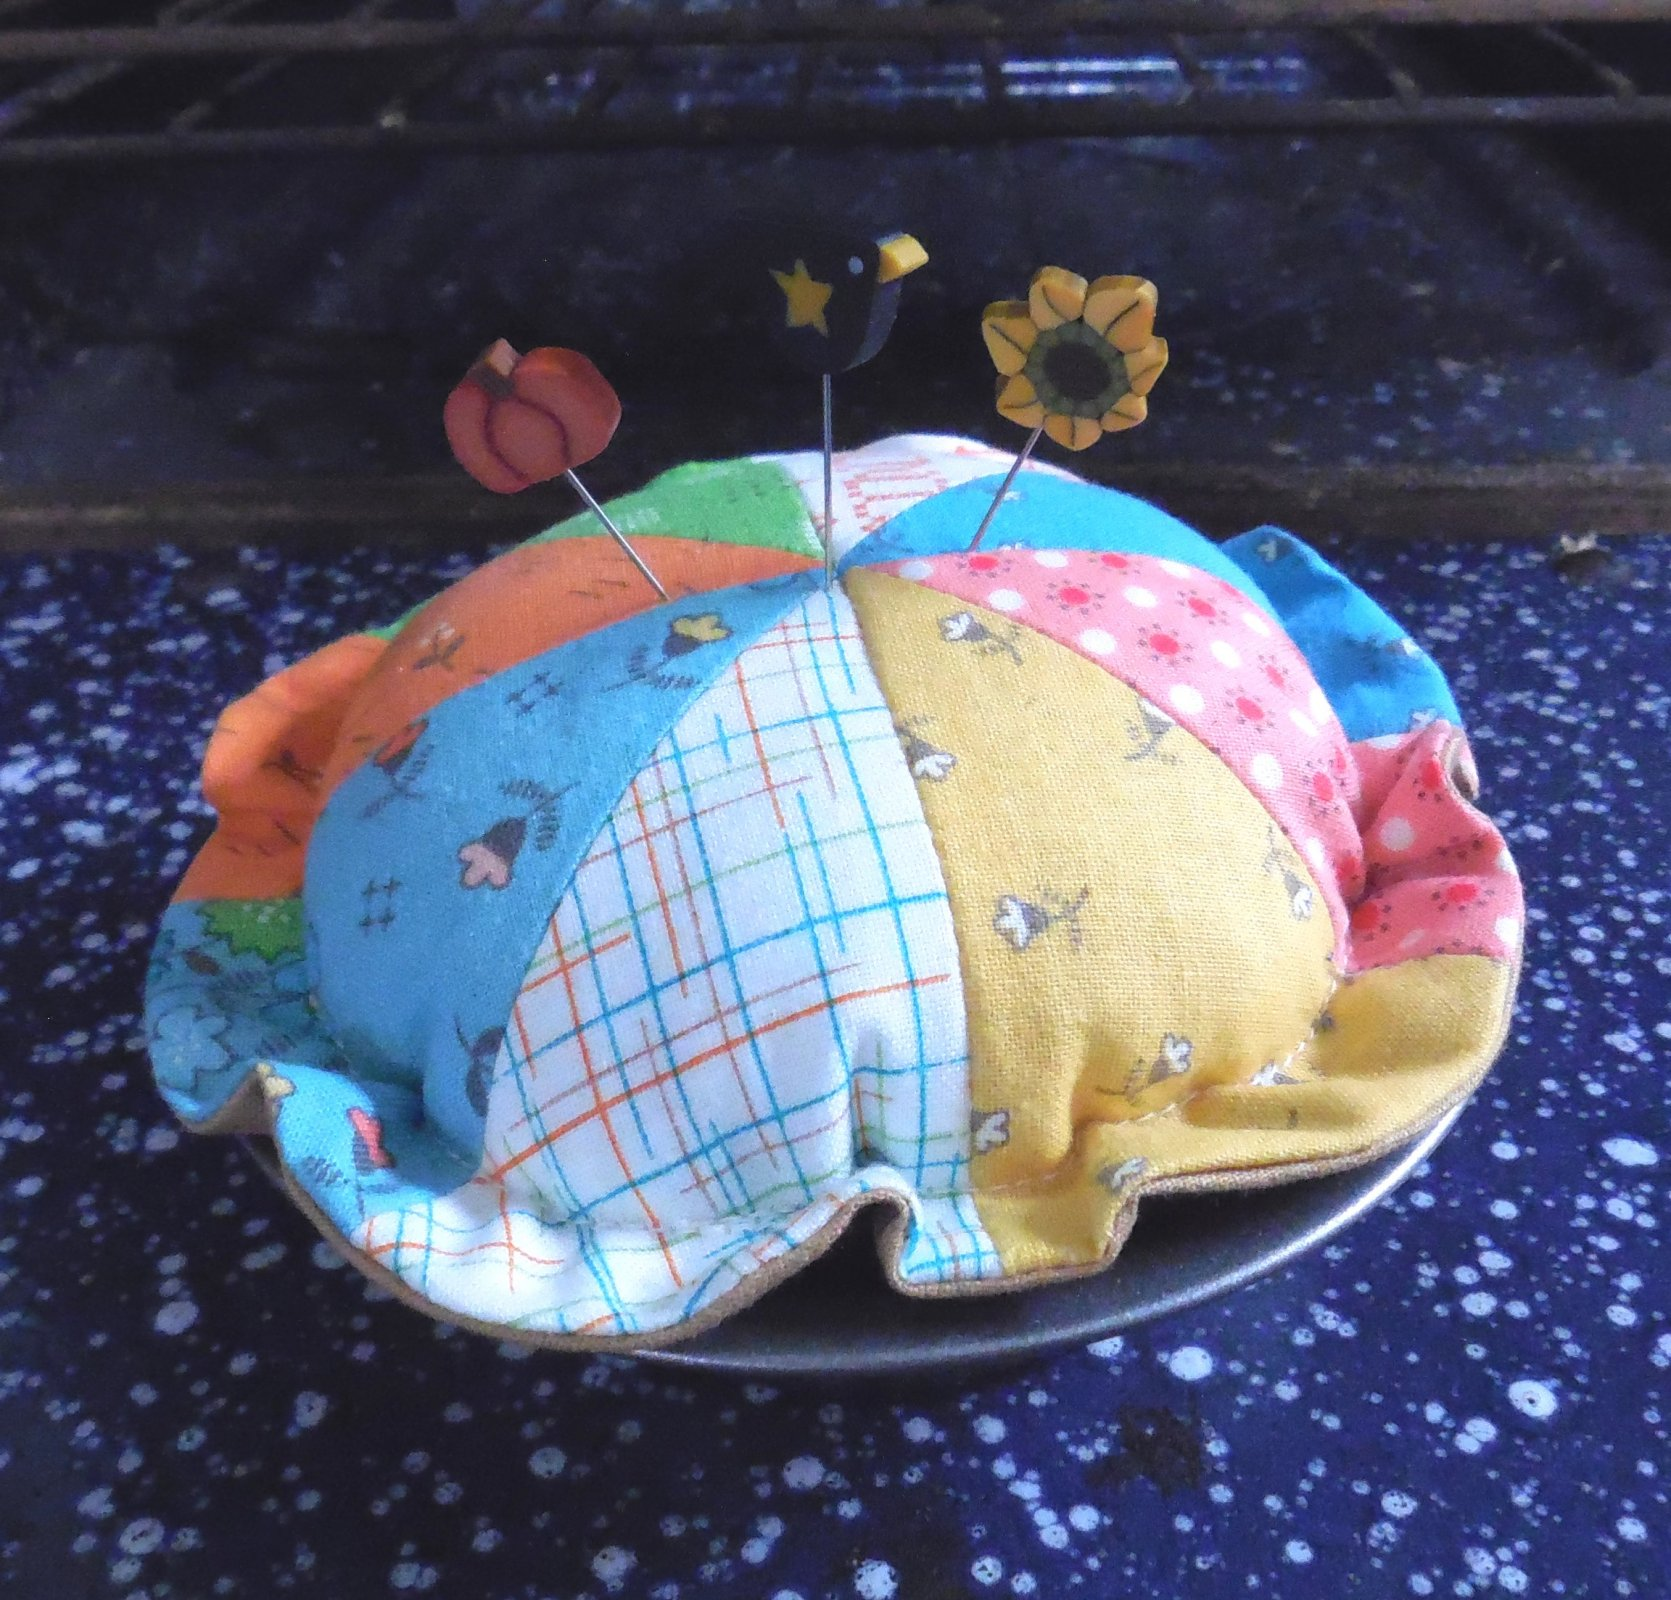 Cutie Pie Pincushion